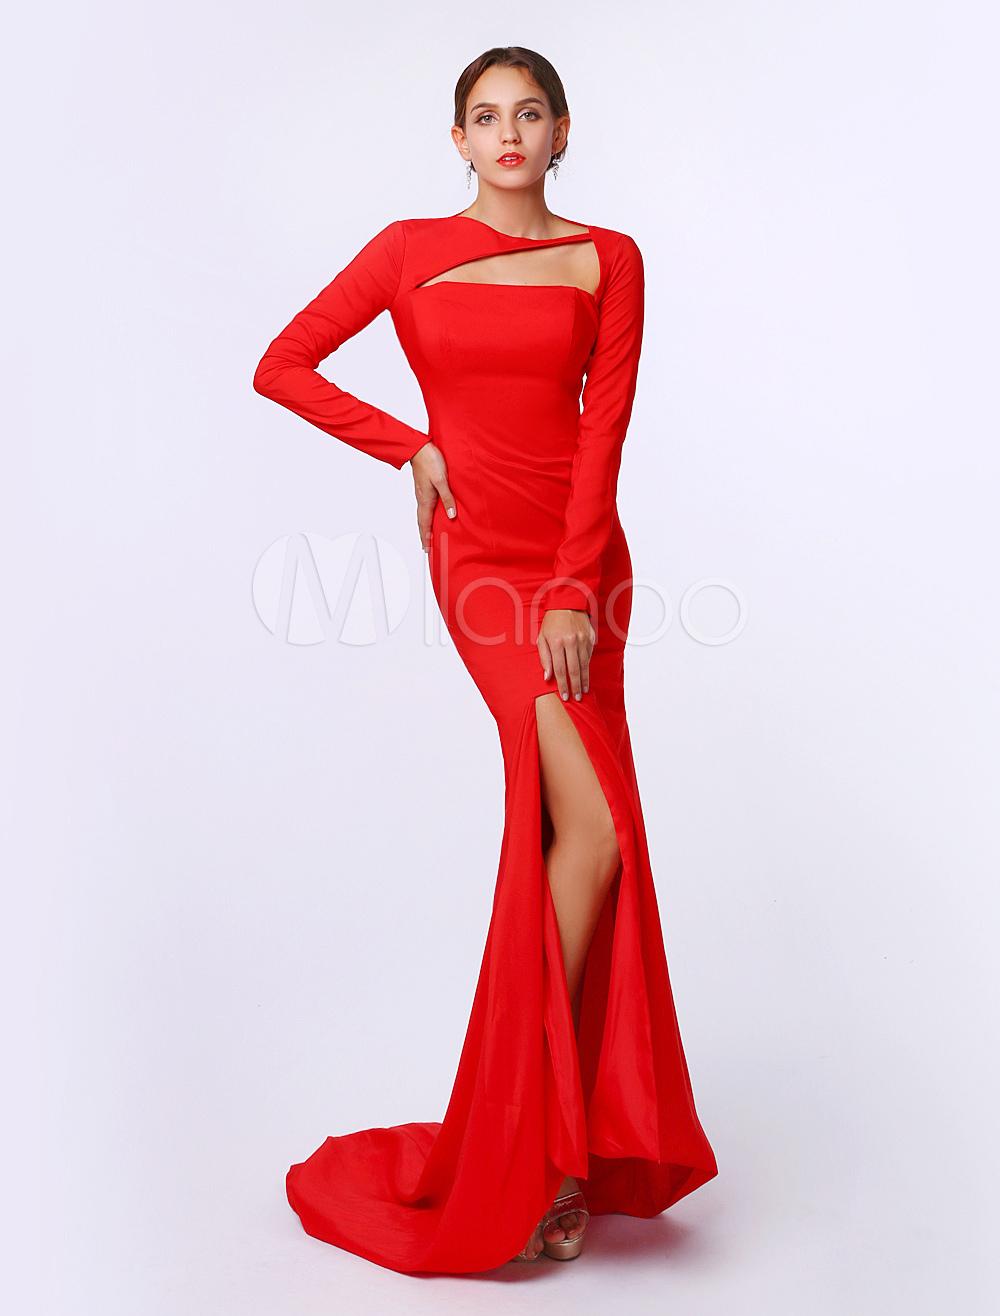 Robe de mariée rouge sirène fendue à col bateau - Milanoo.com